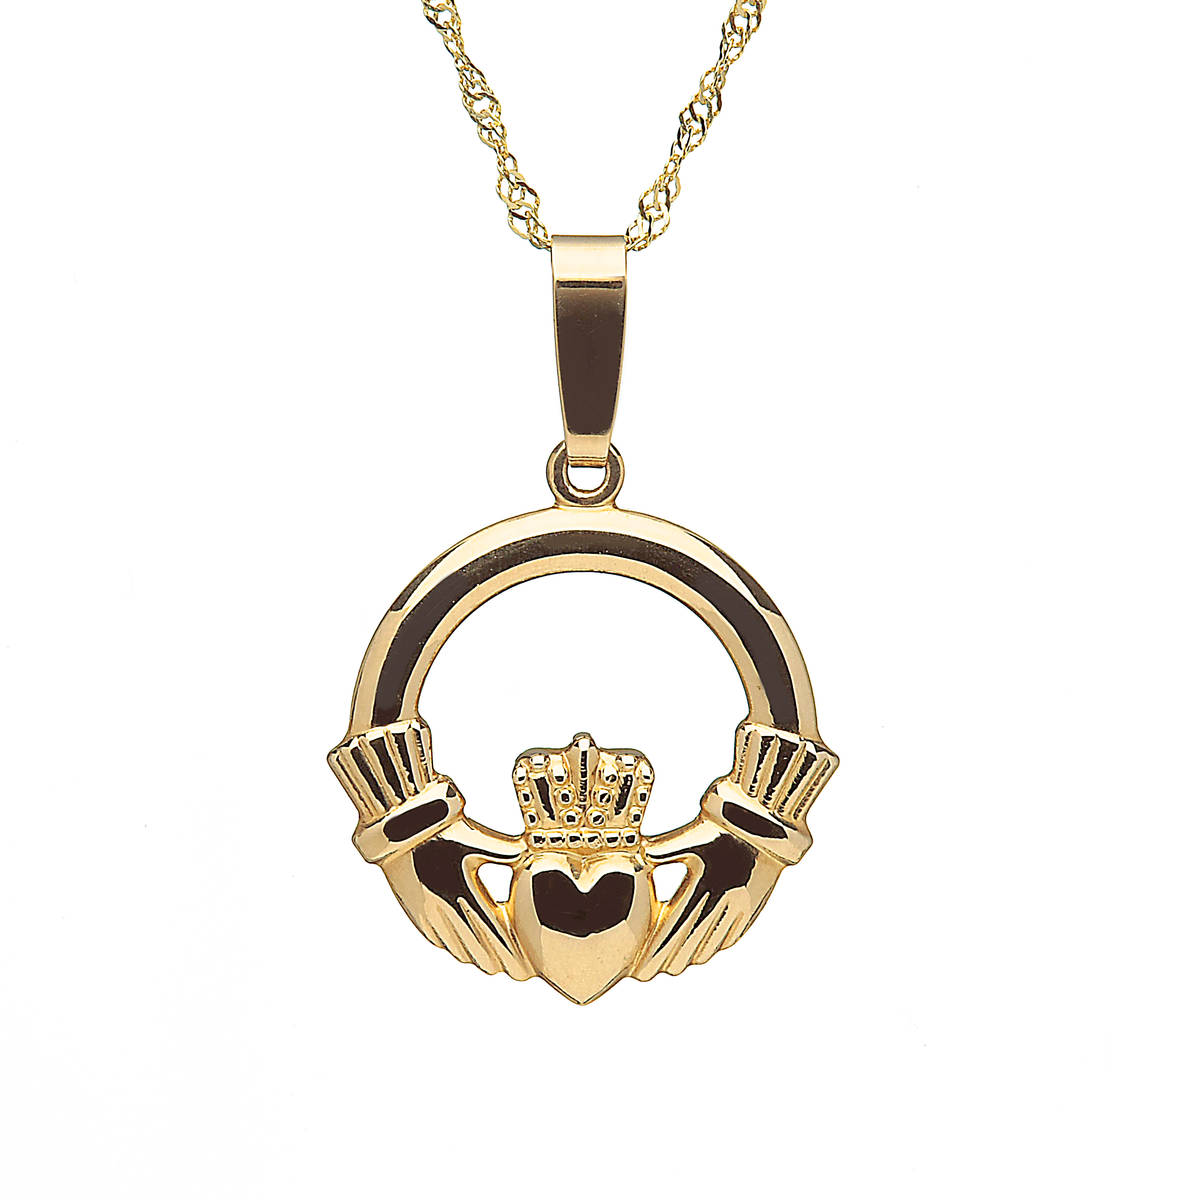 10 carat yellow gold claddagh pendant